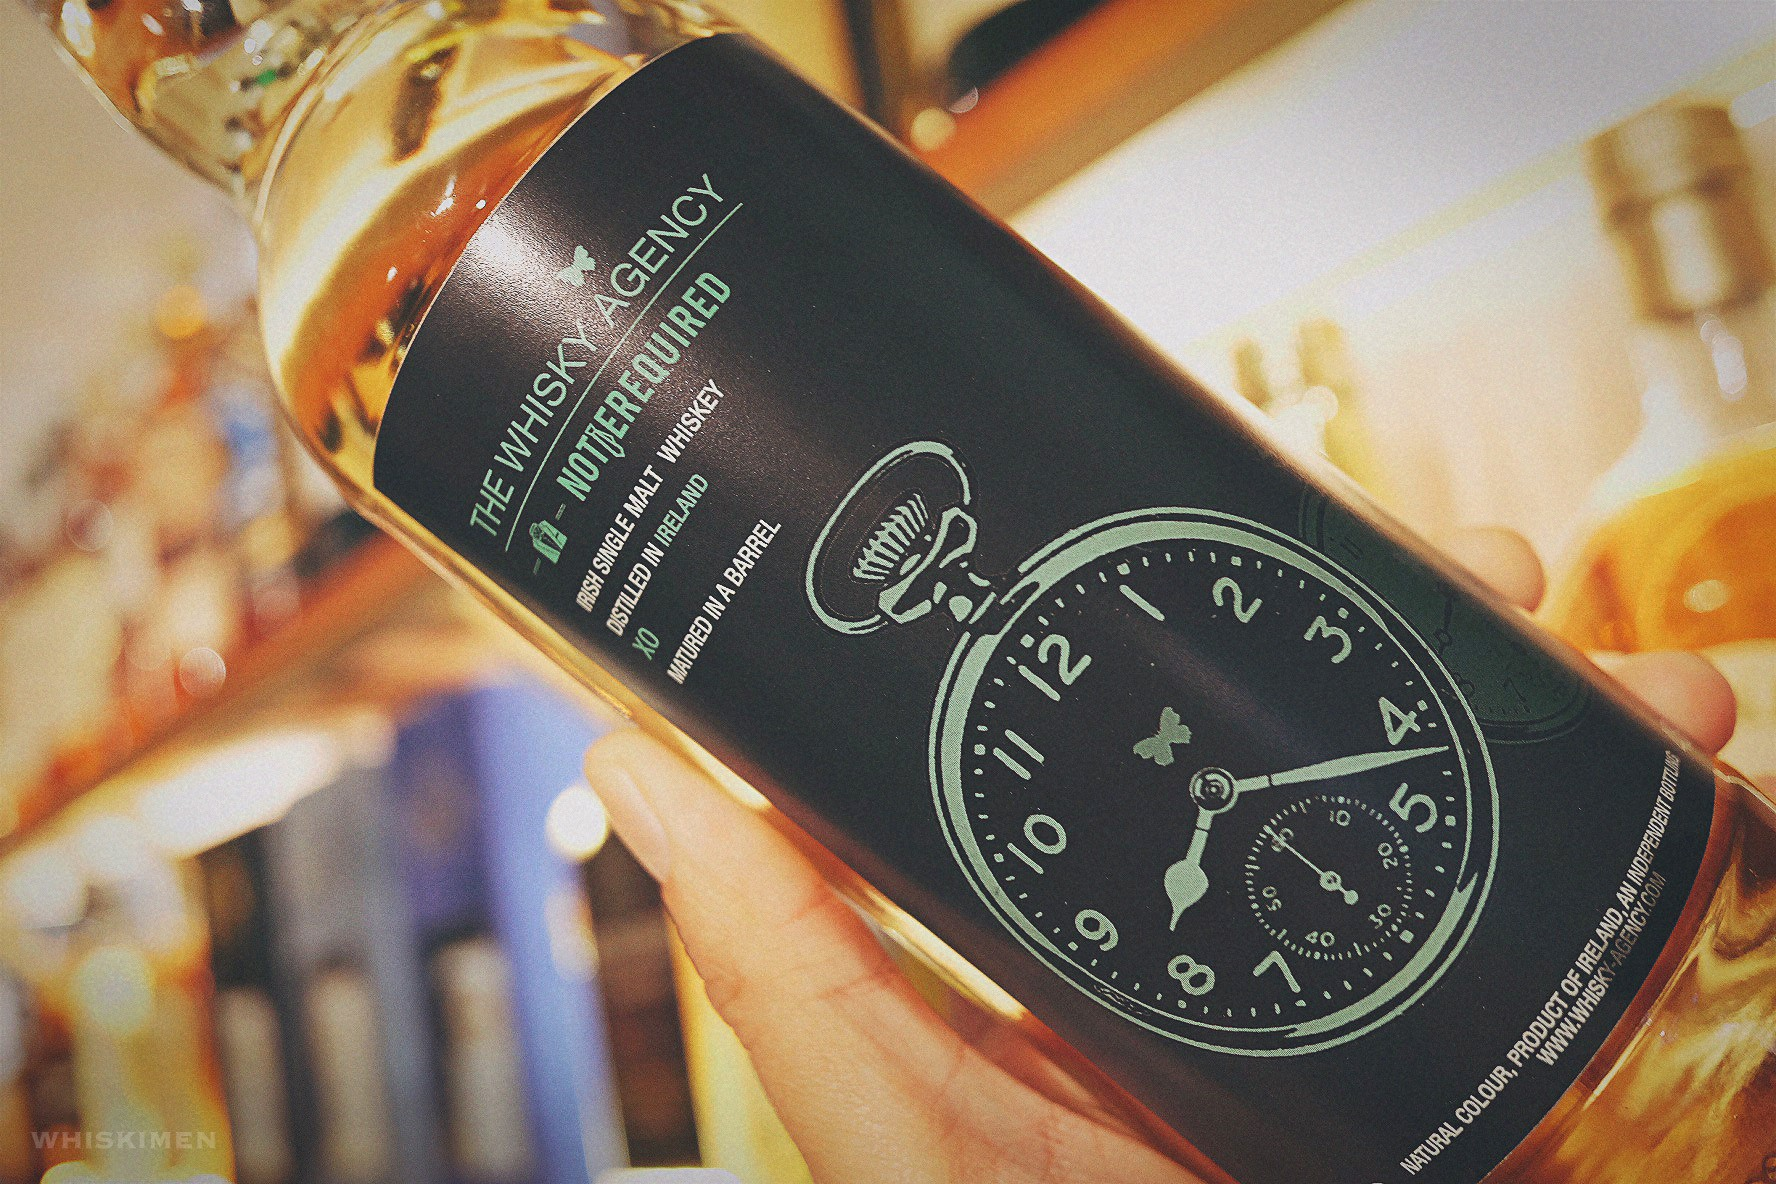 The Whisky Aganecy x Notierequired Extra Old Irish Single Malt Whiskey